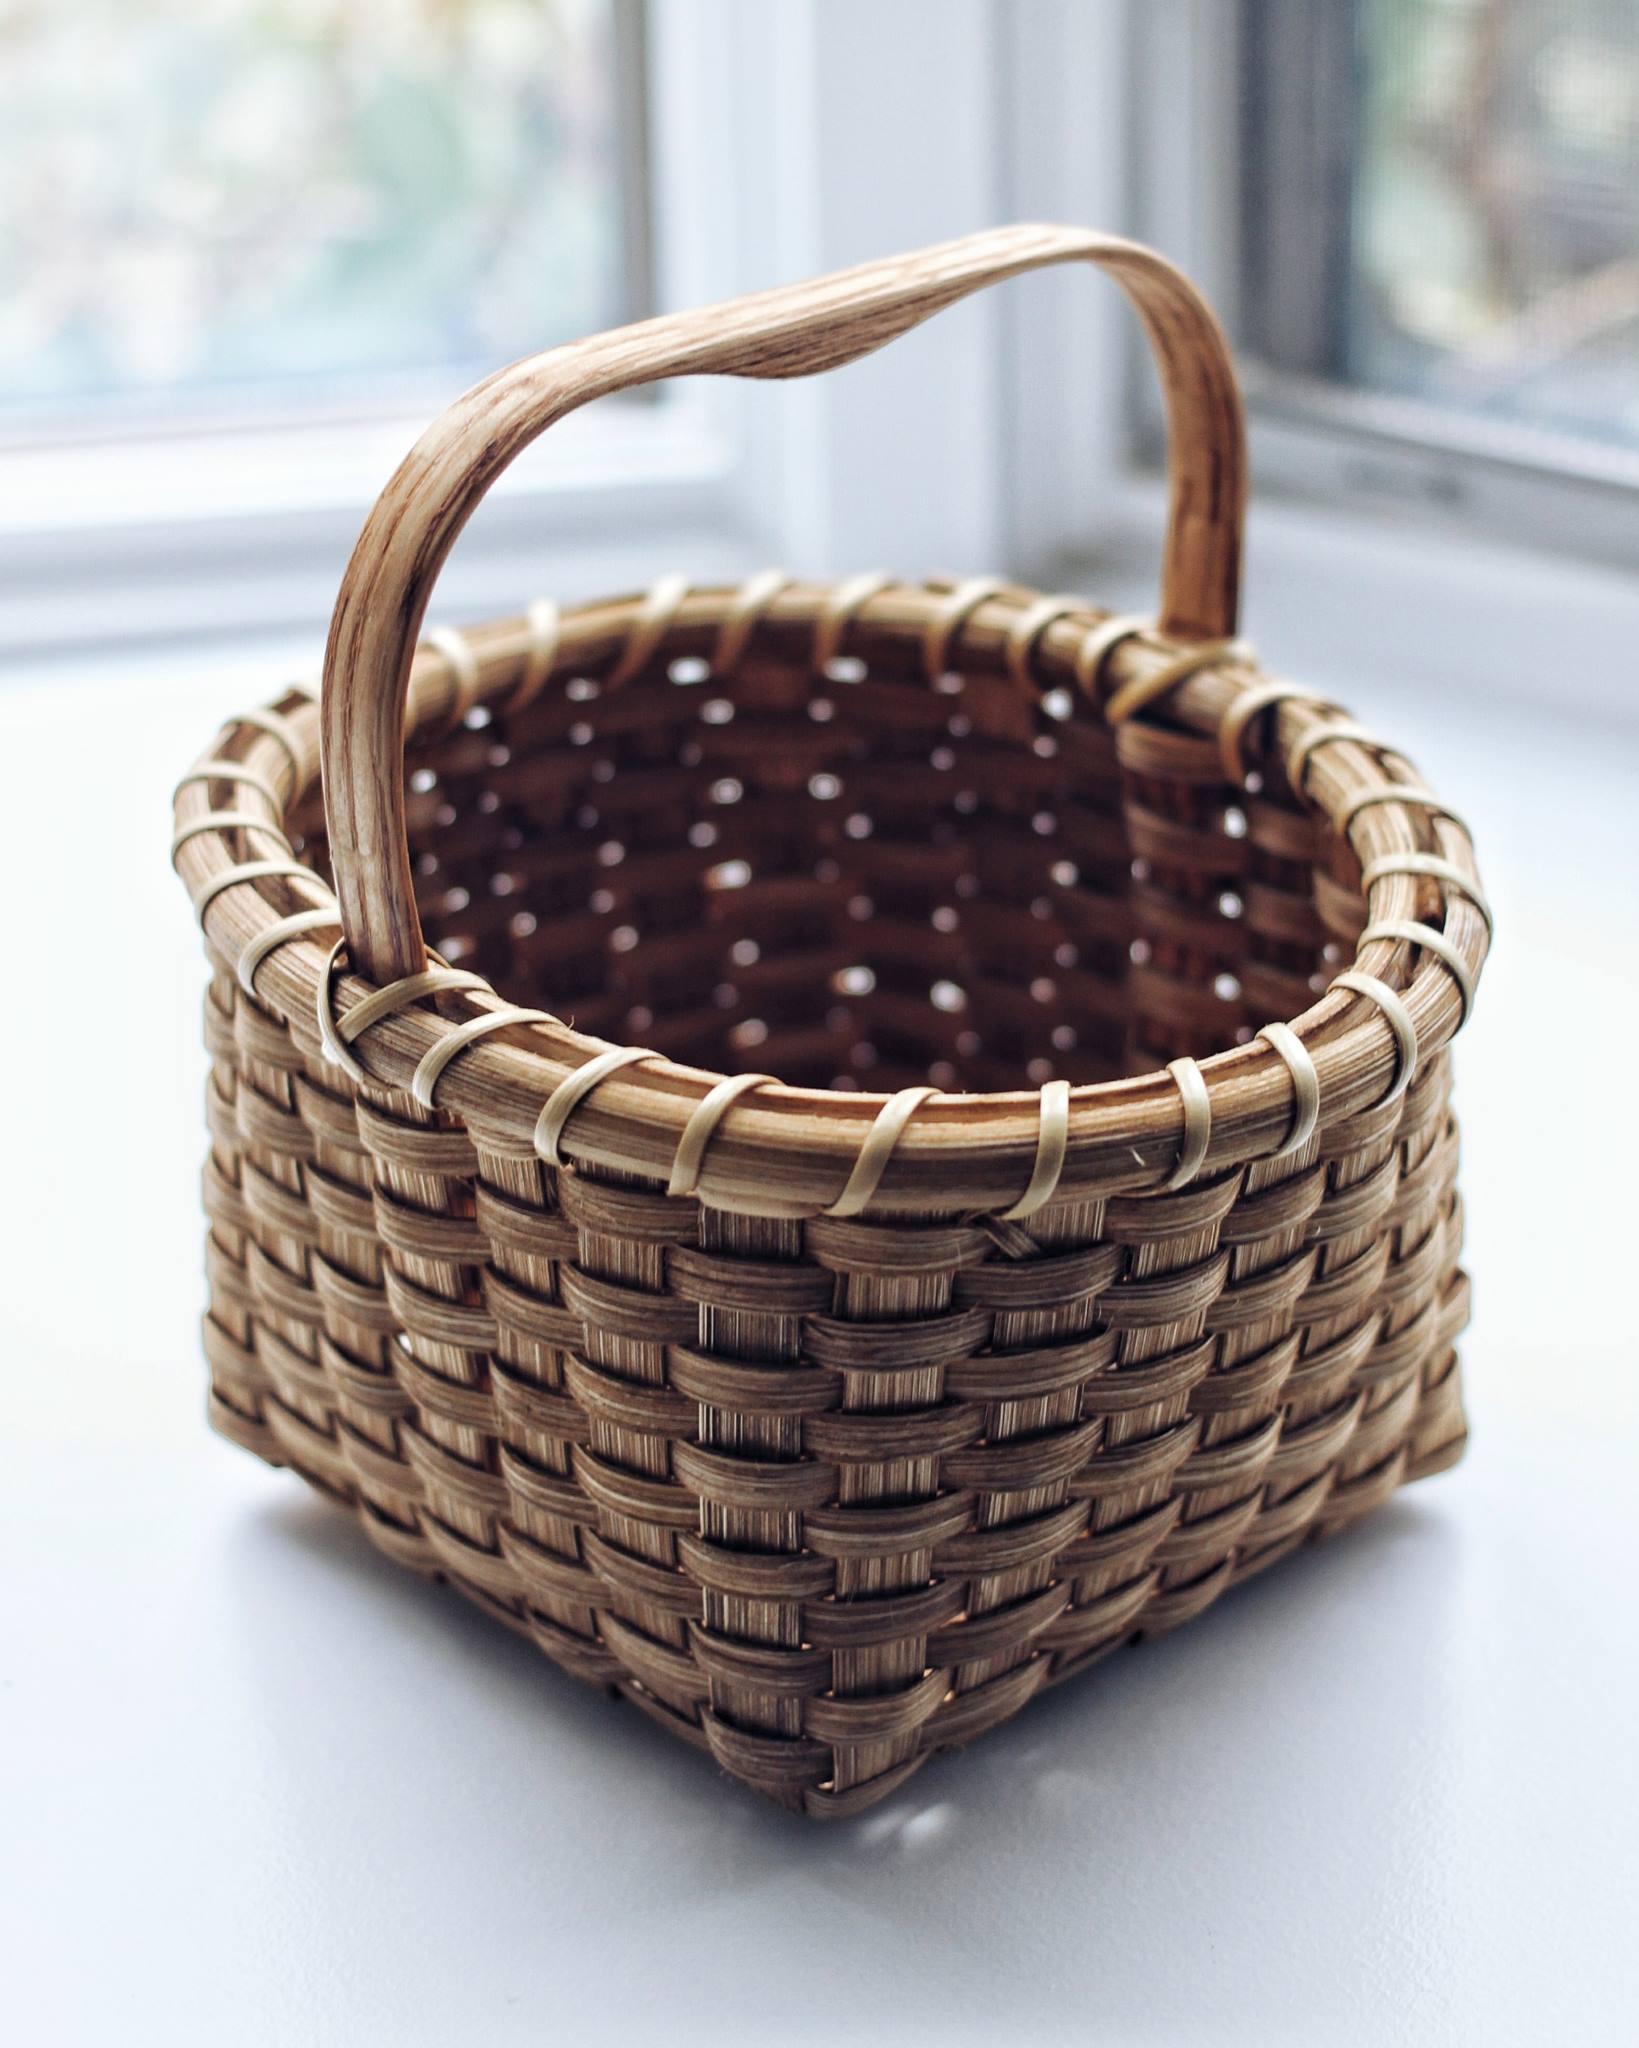 Cape Cod Blueberry Basket